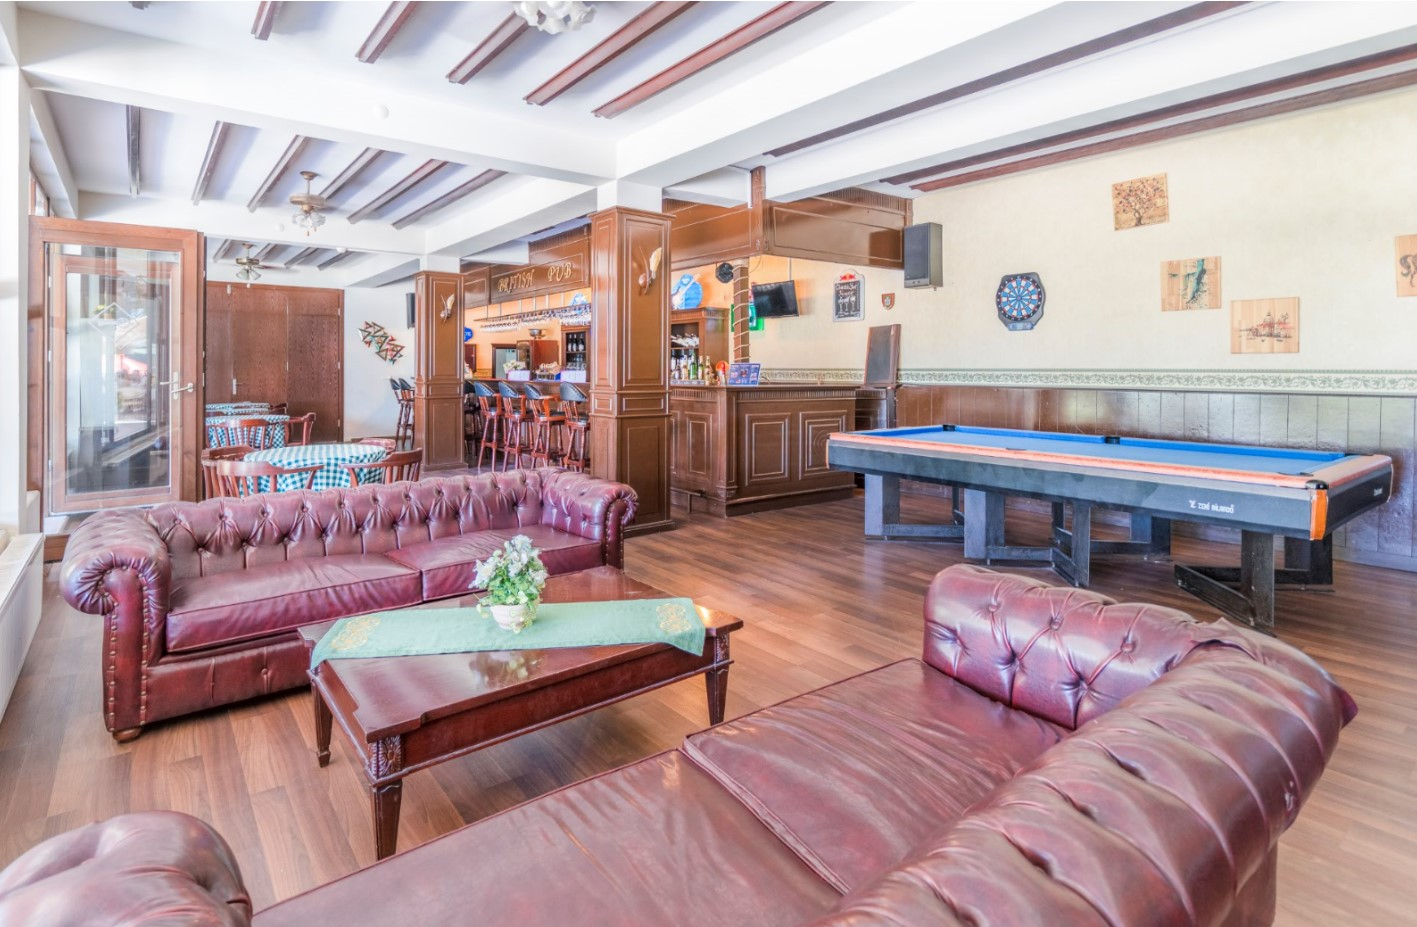 Letovanje Turska autobusom, Čanakkale, Hotel Troja Tusan,bilijar